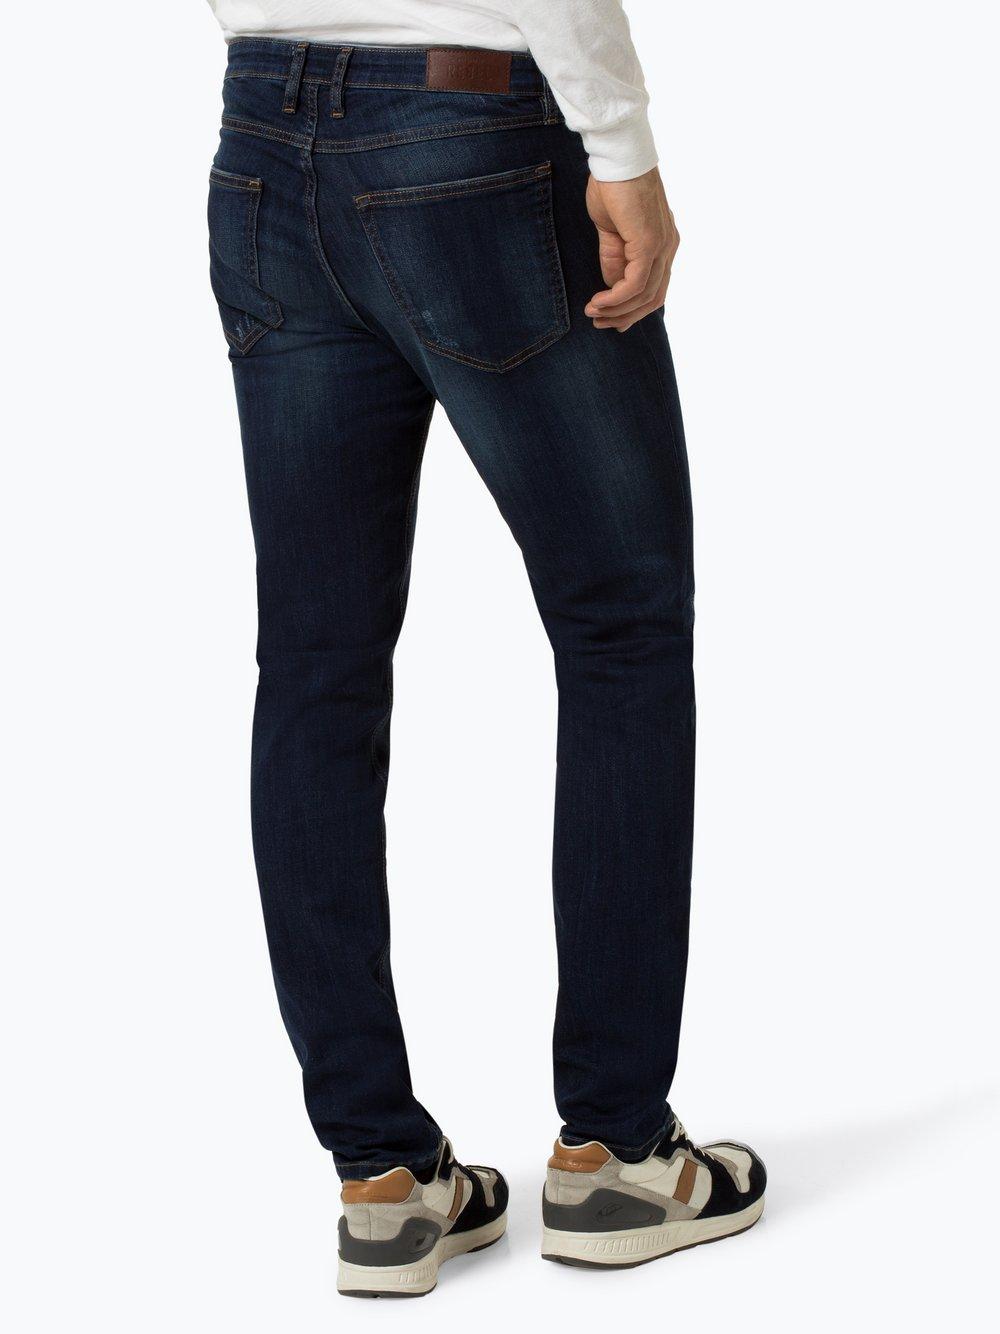 Redefined Rebel Herren Jeans Milano Destroy online kaufen